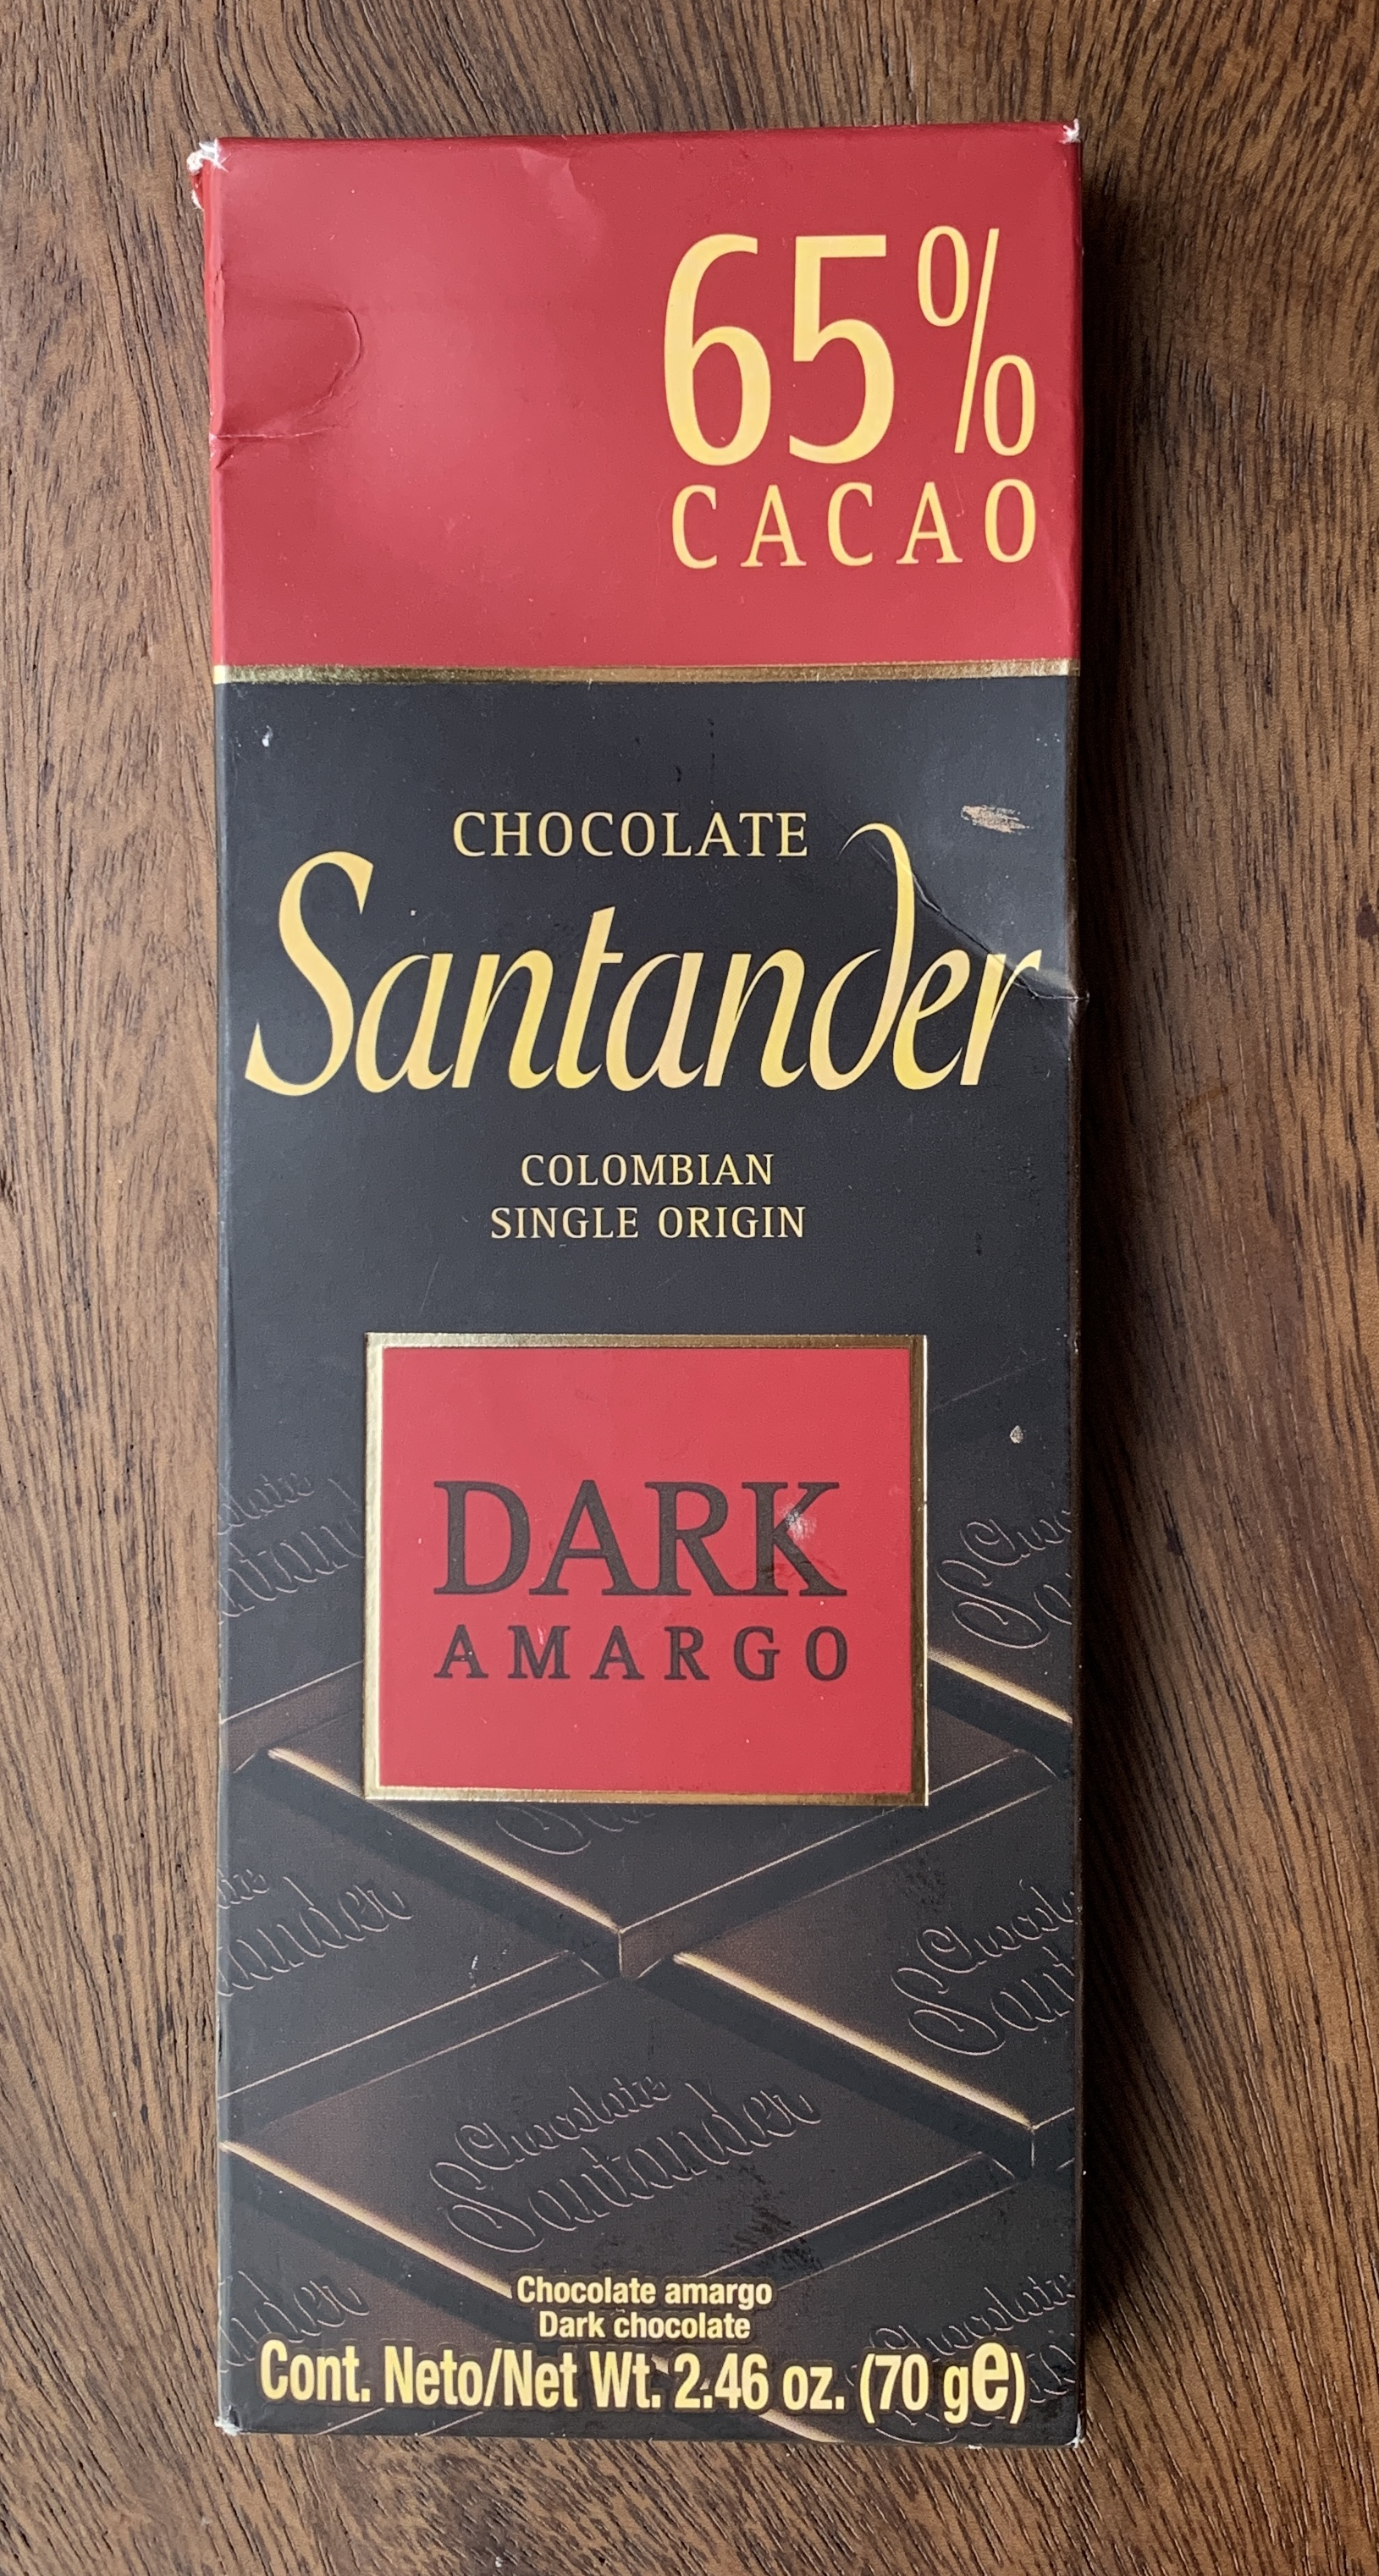 Santander - Deer heavy roast, coffee, toasted walnut  skins